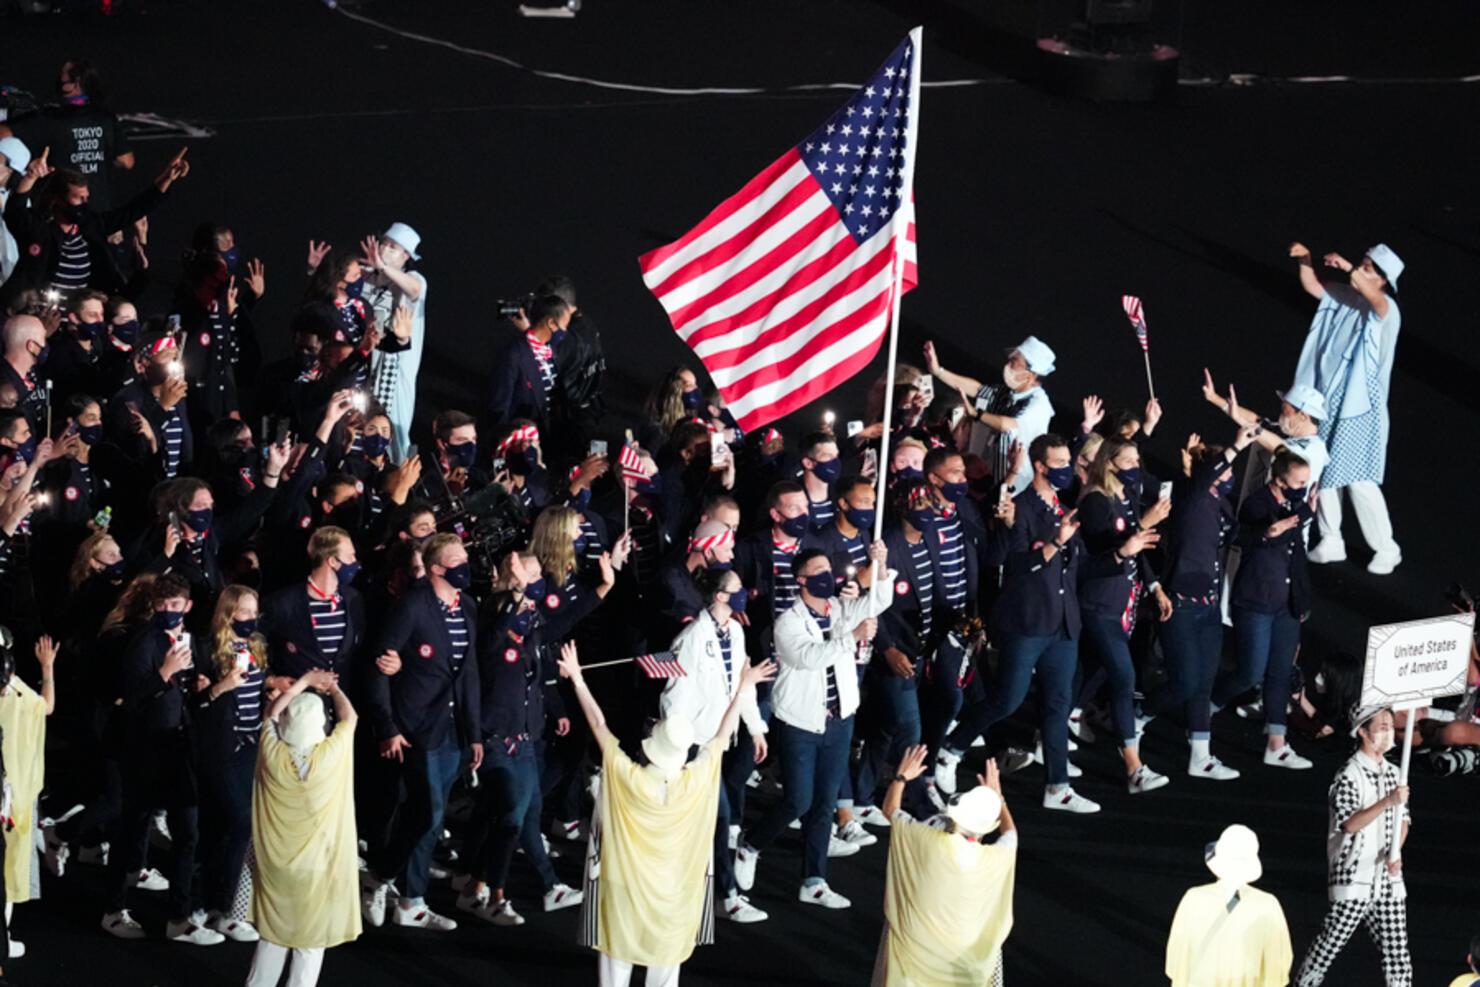 Tokyo 2020 Olympics - Opening Ceremony